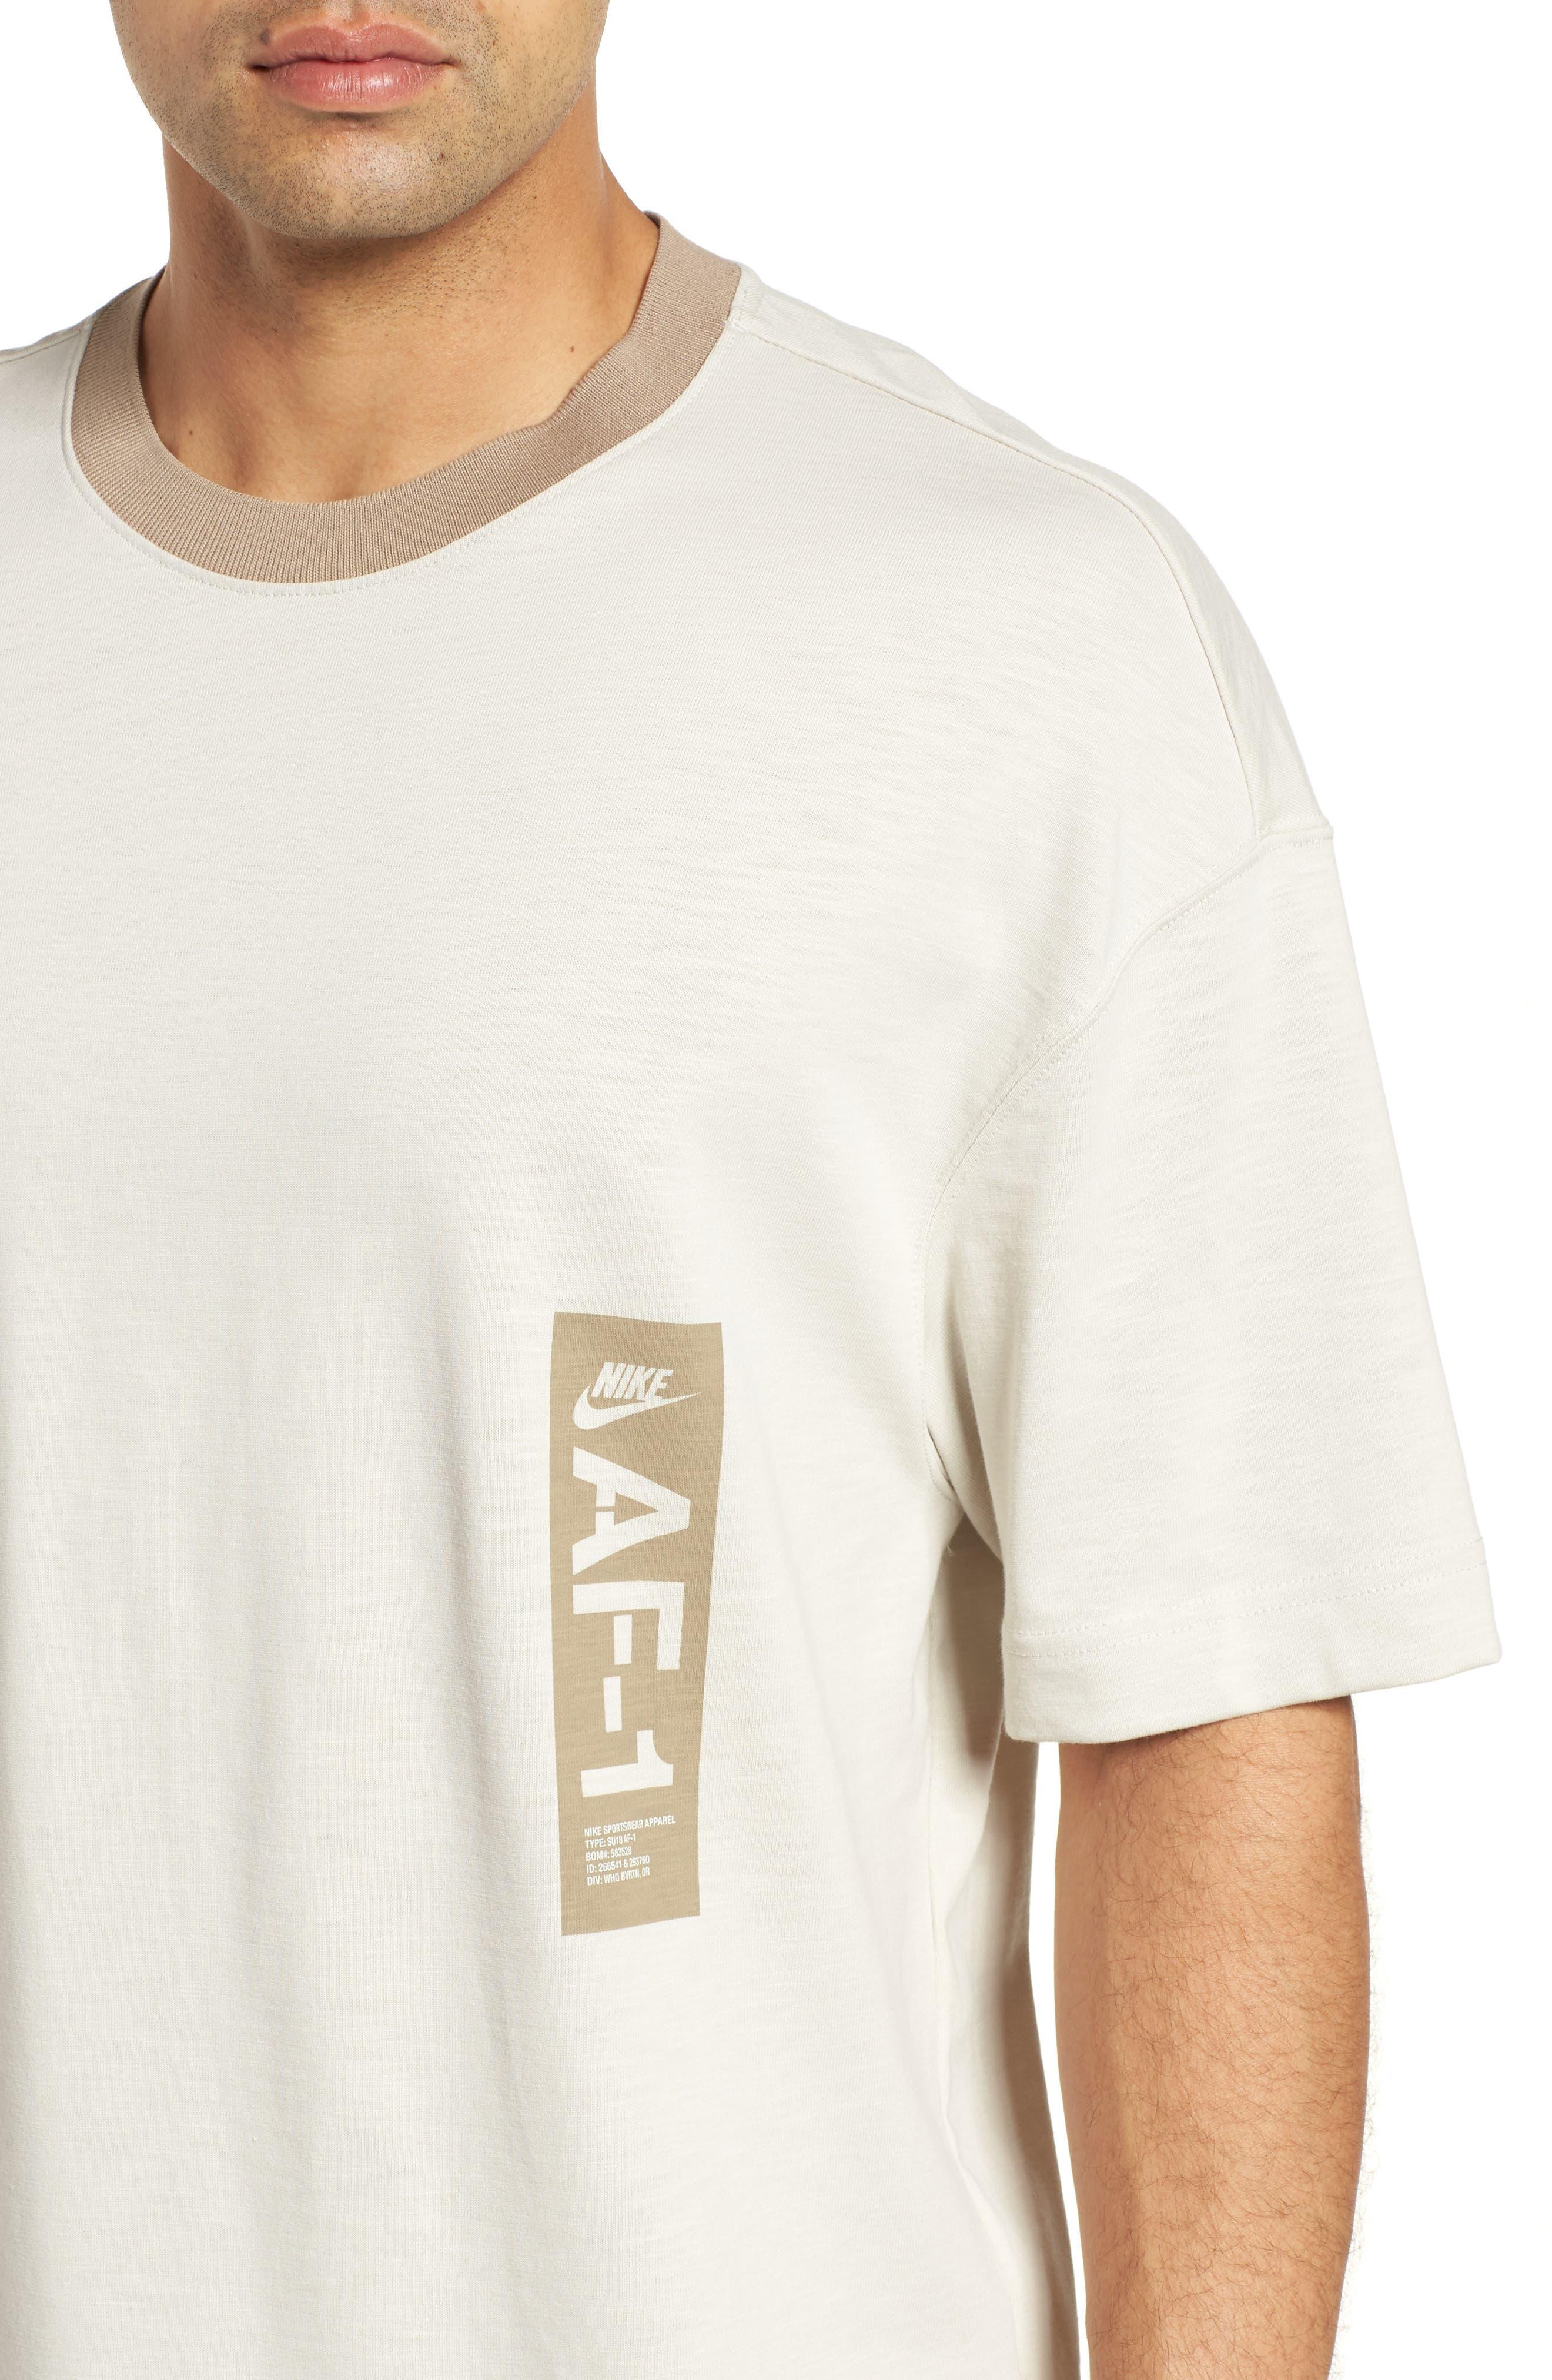 Sportswear AF1 Graphic T-Shirt,                             Alternate thumbnail 4, color,                             LIGHT BONE/ KHAKI